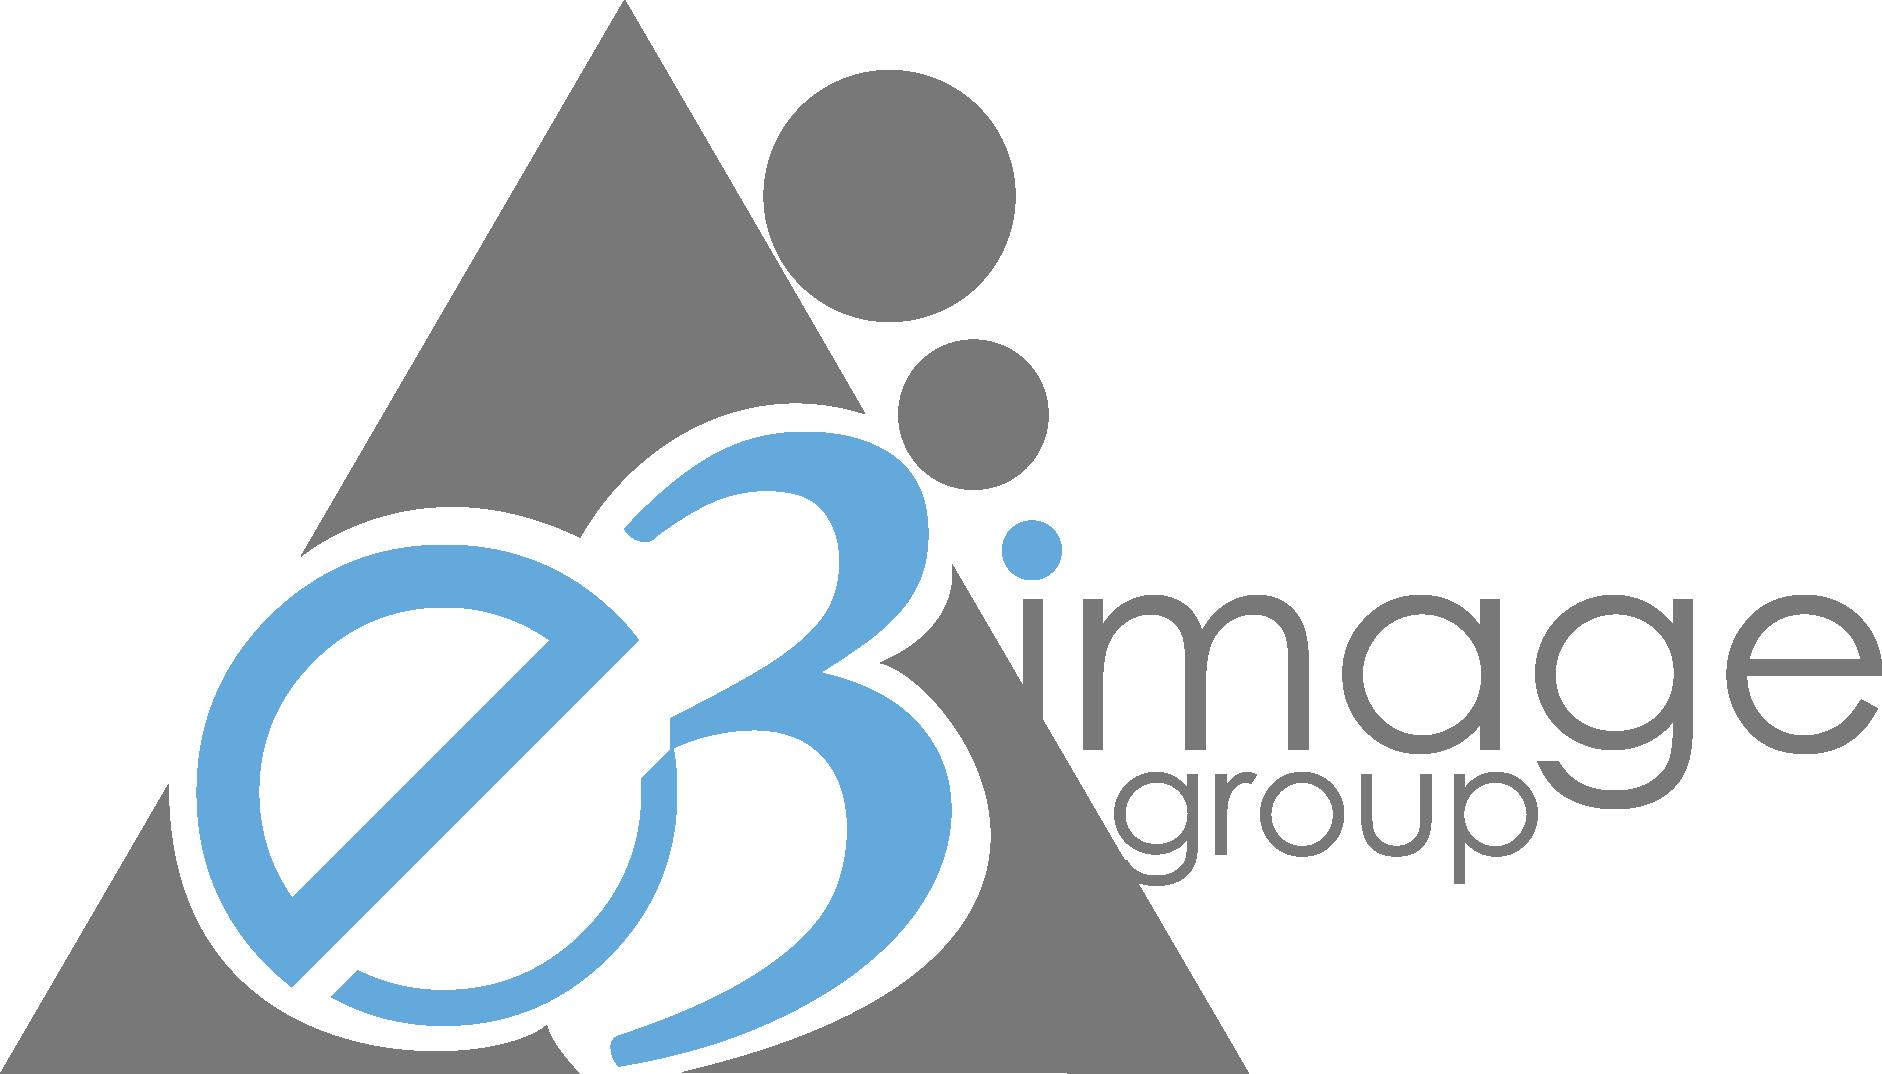 E3ImgGrp_Logo.png